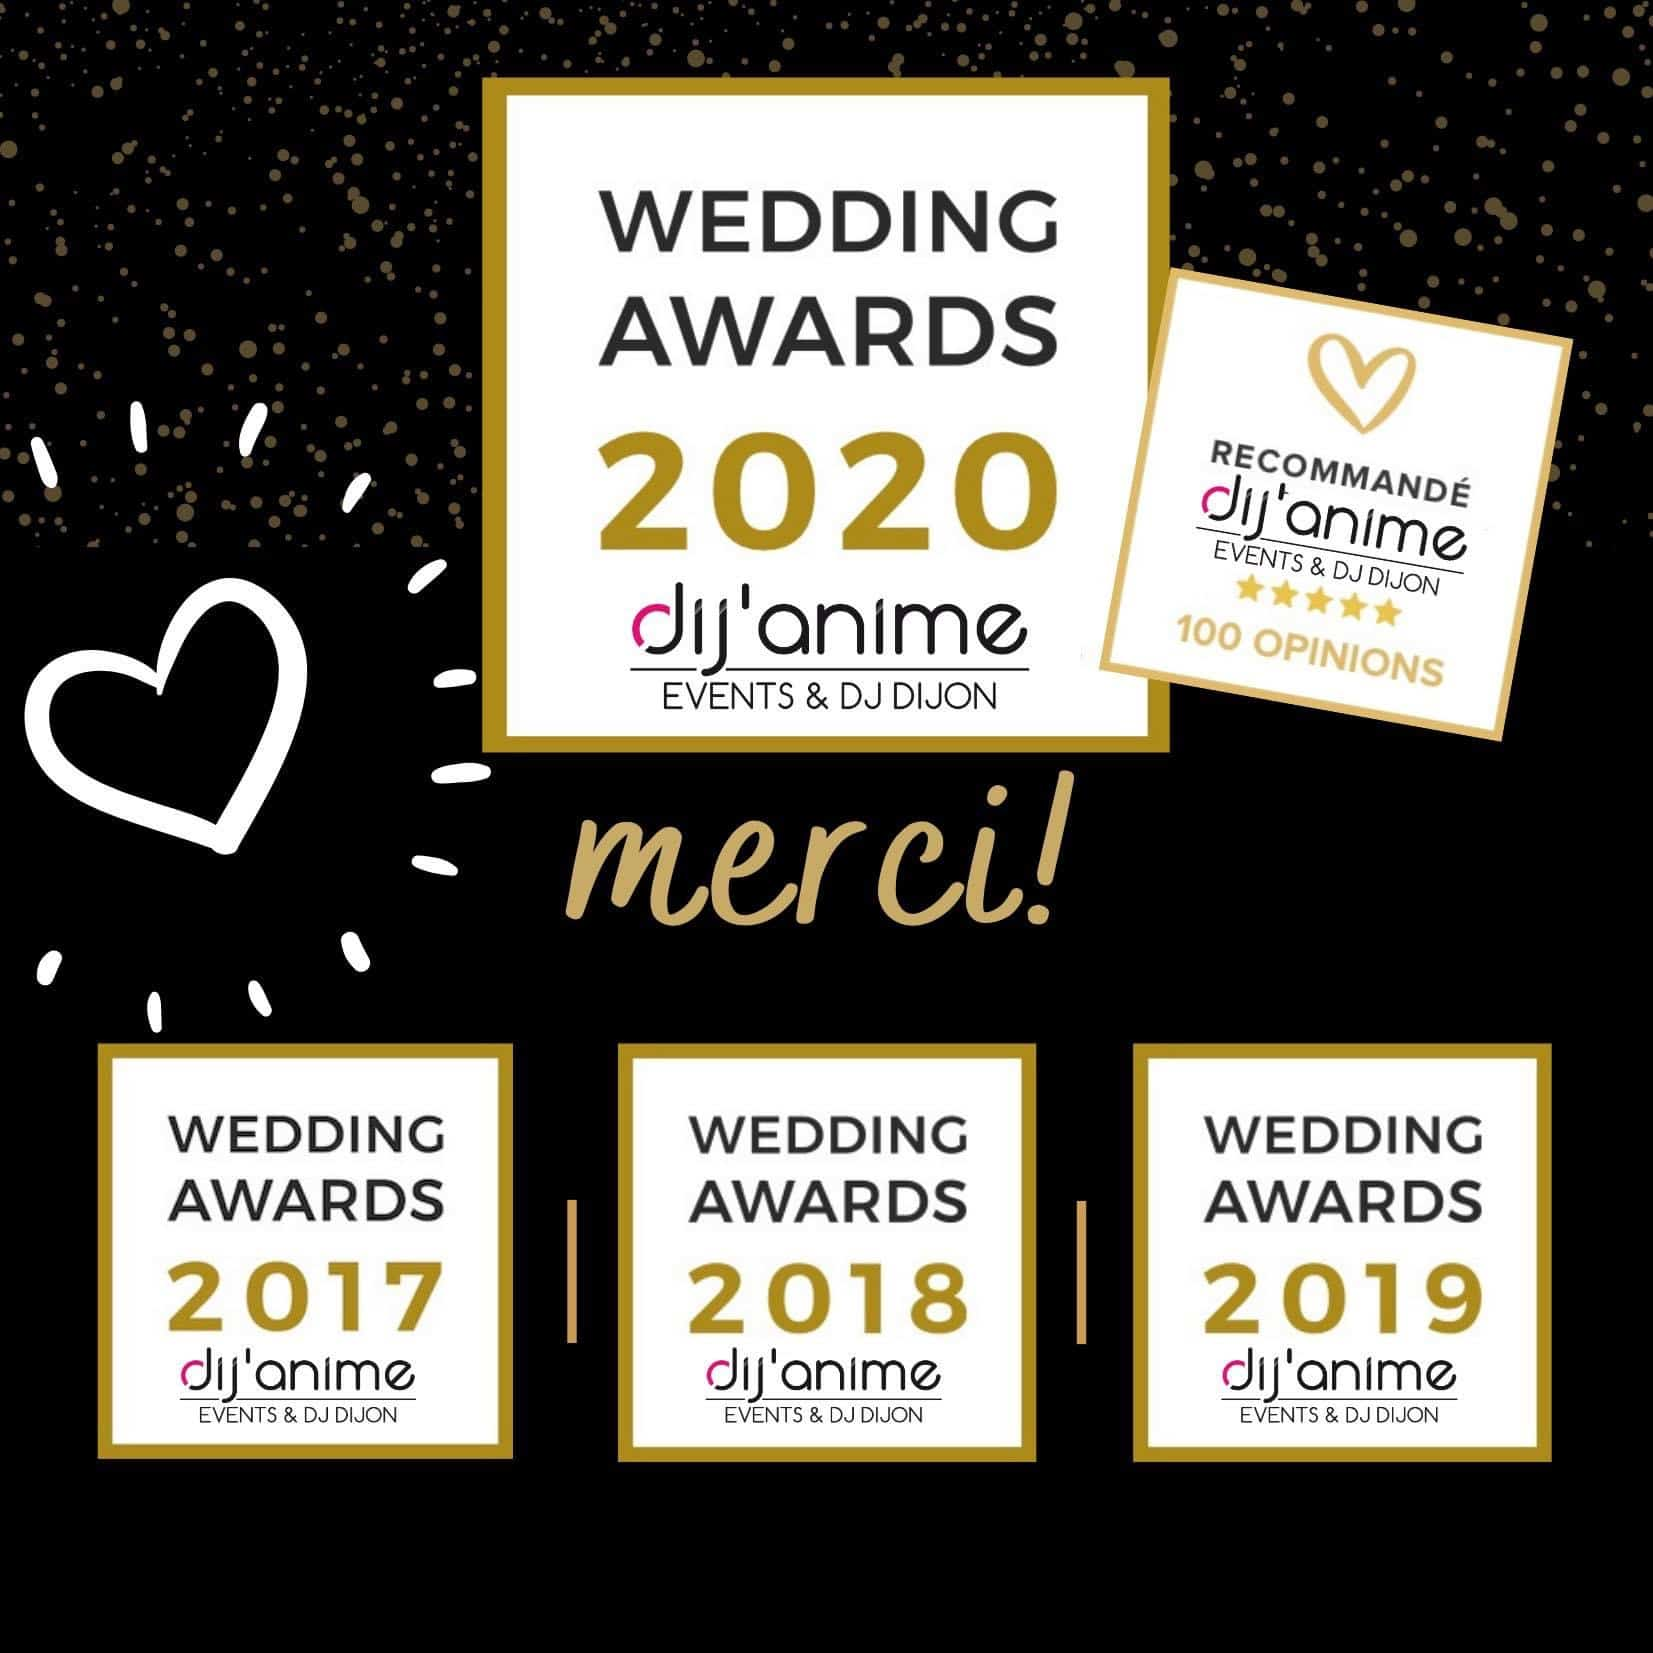 Les Wedding Awards 2016, 2017, 2018, 2019, 2020.